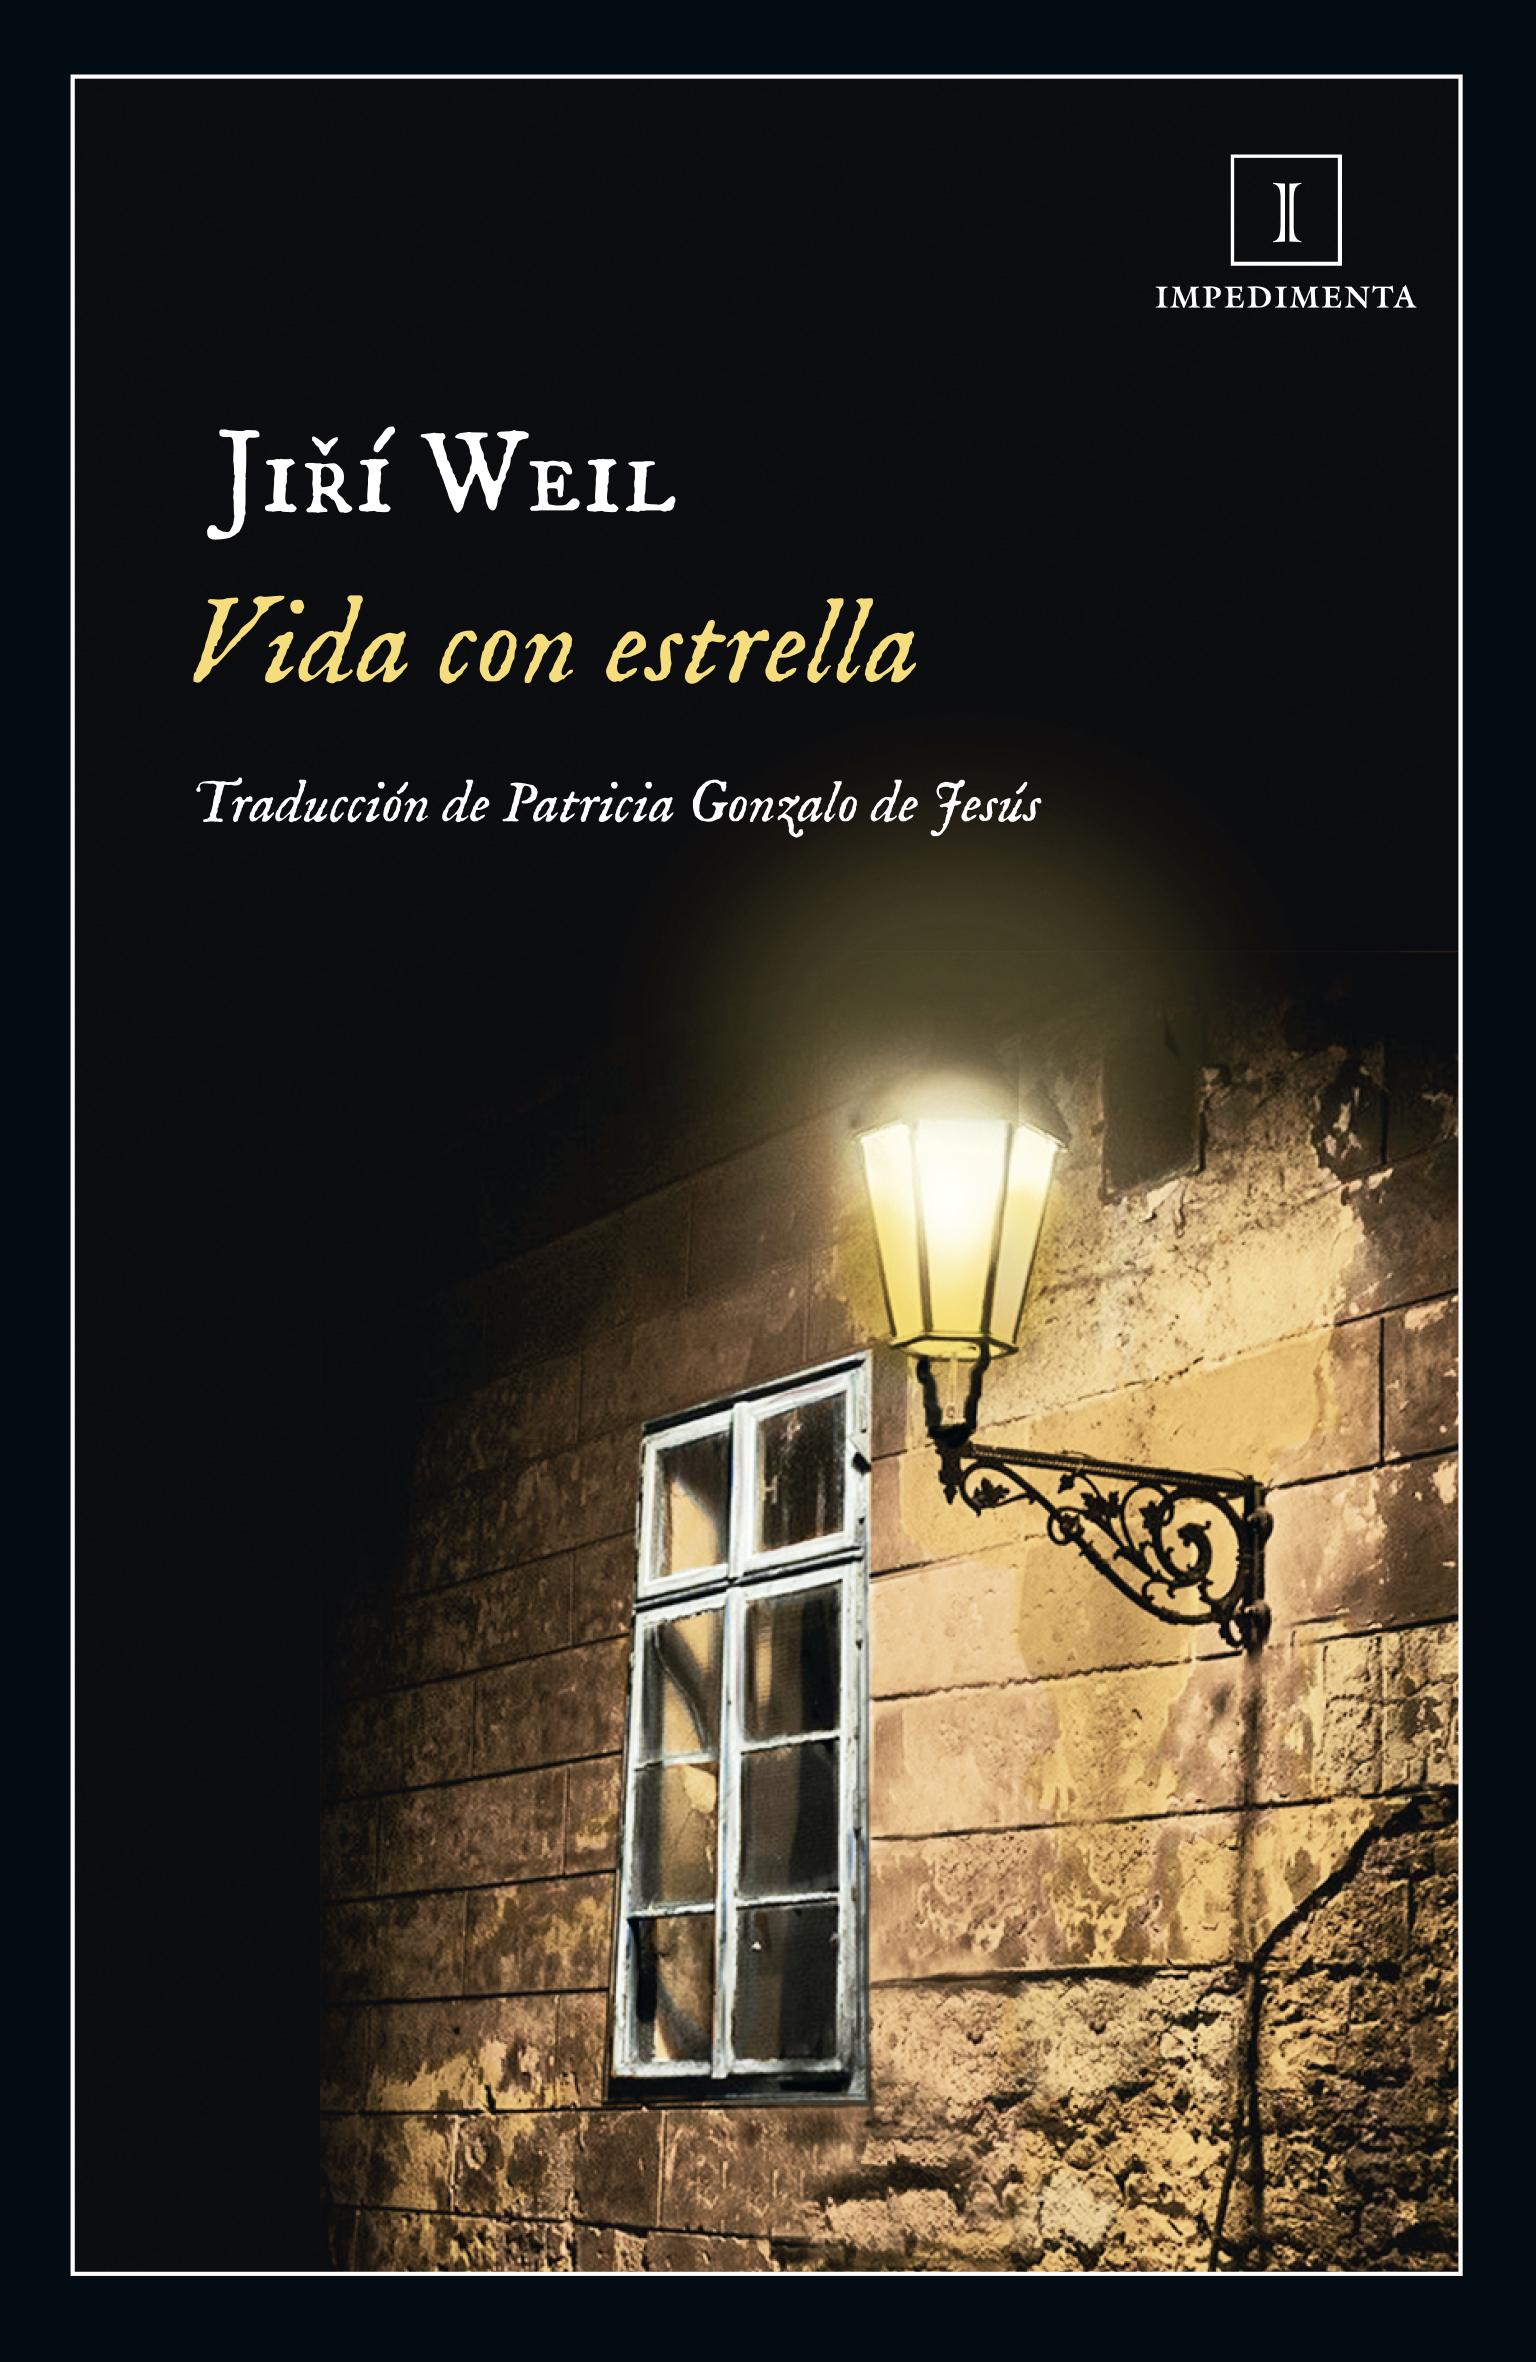 Portada de la novela «Vida con estrella», de Jirí Weil